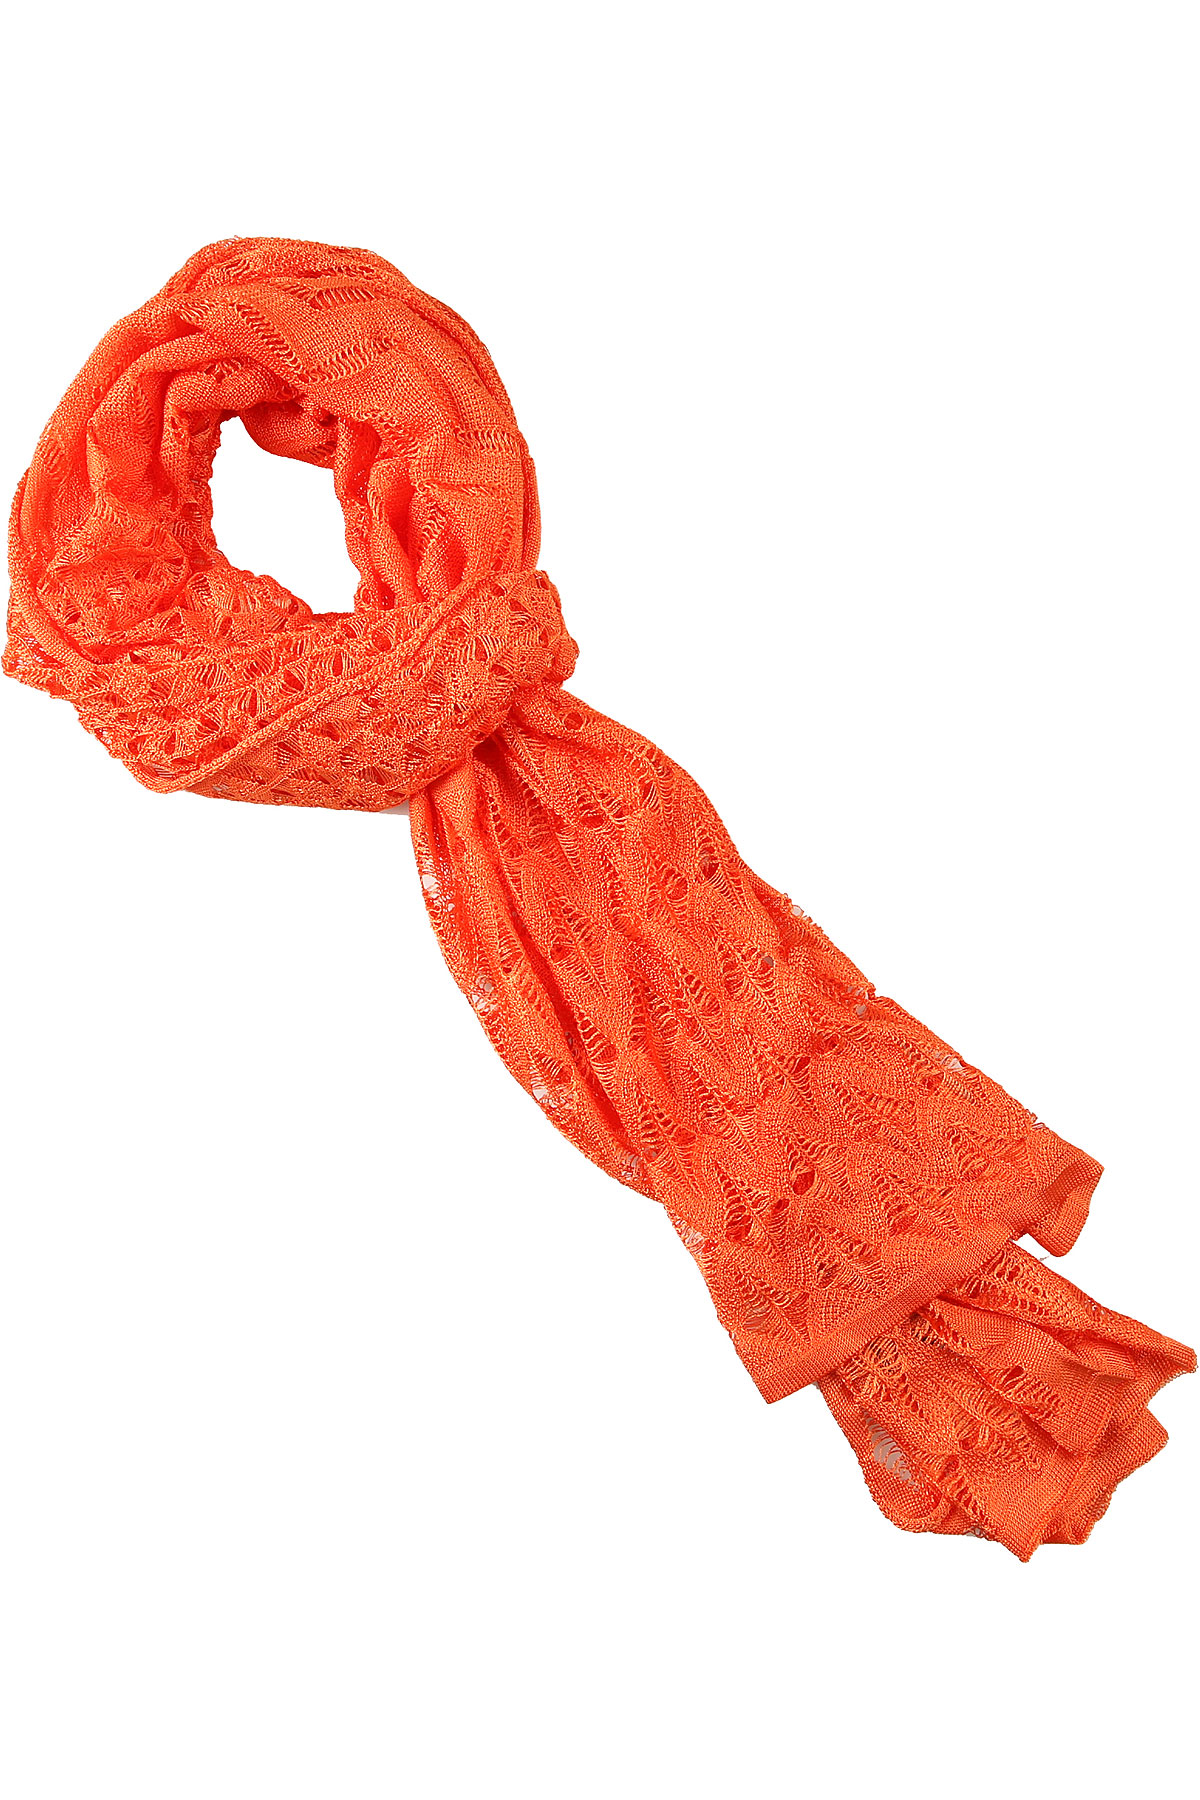 Missoni Scarf for Women On Sale, Orange, Viscose, 2019